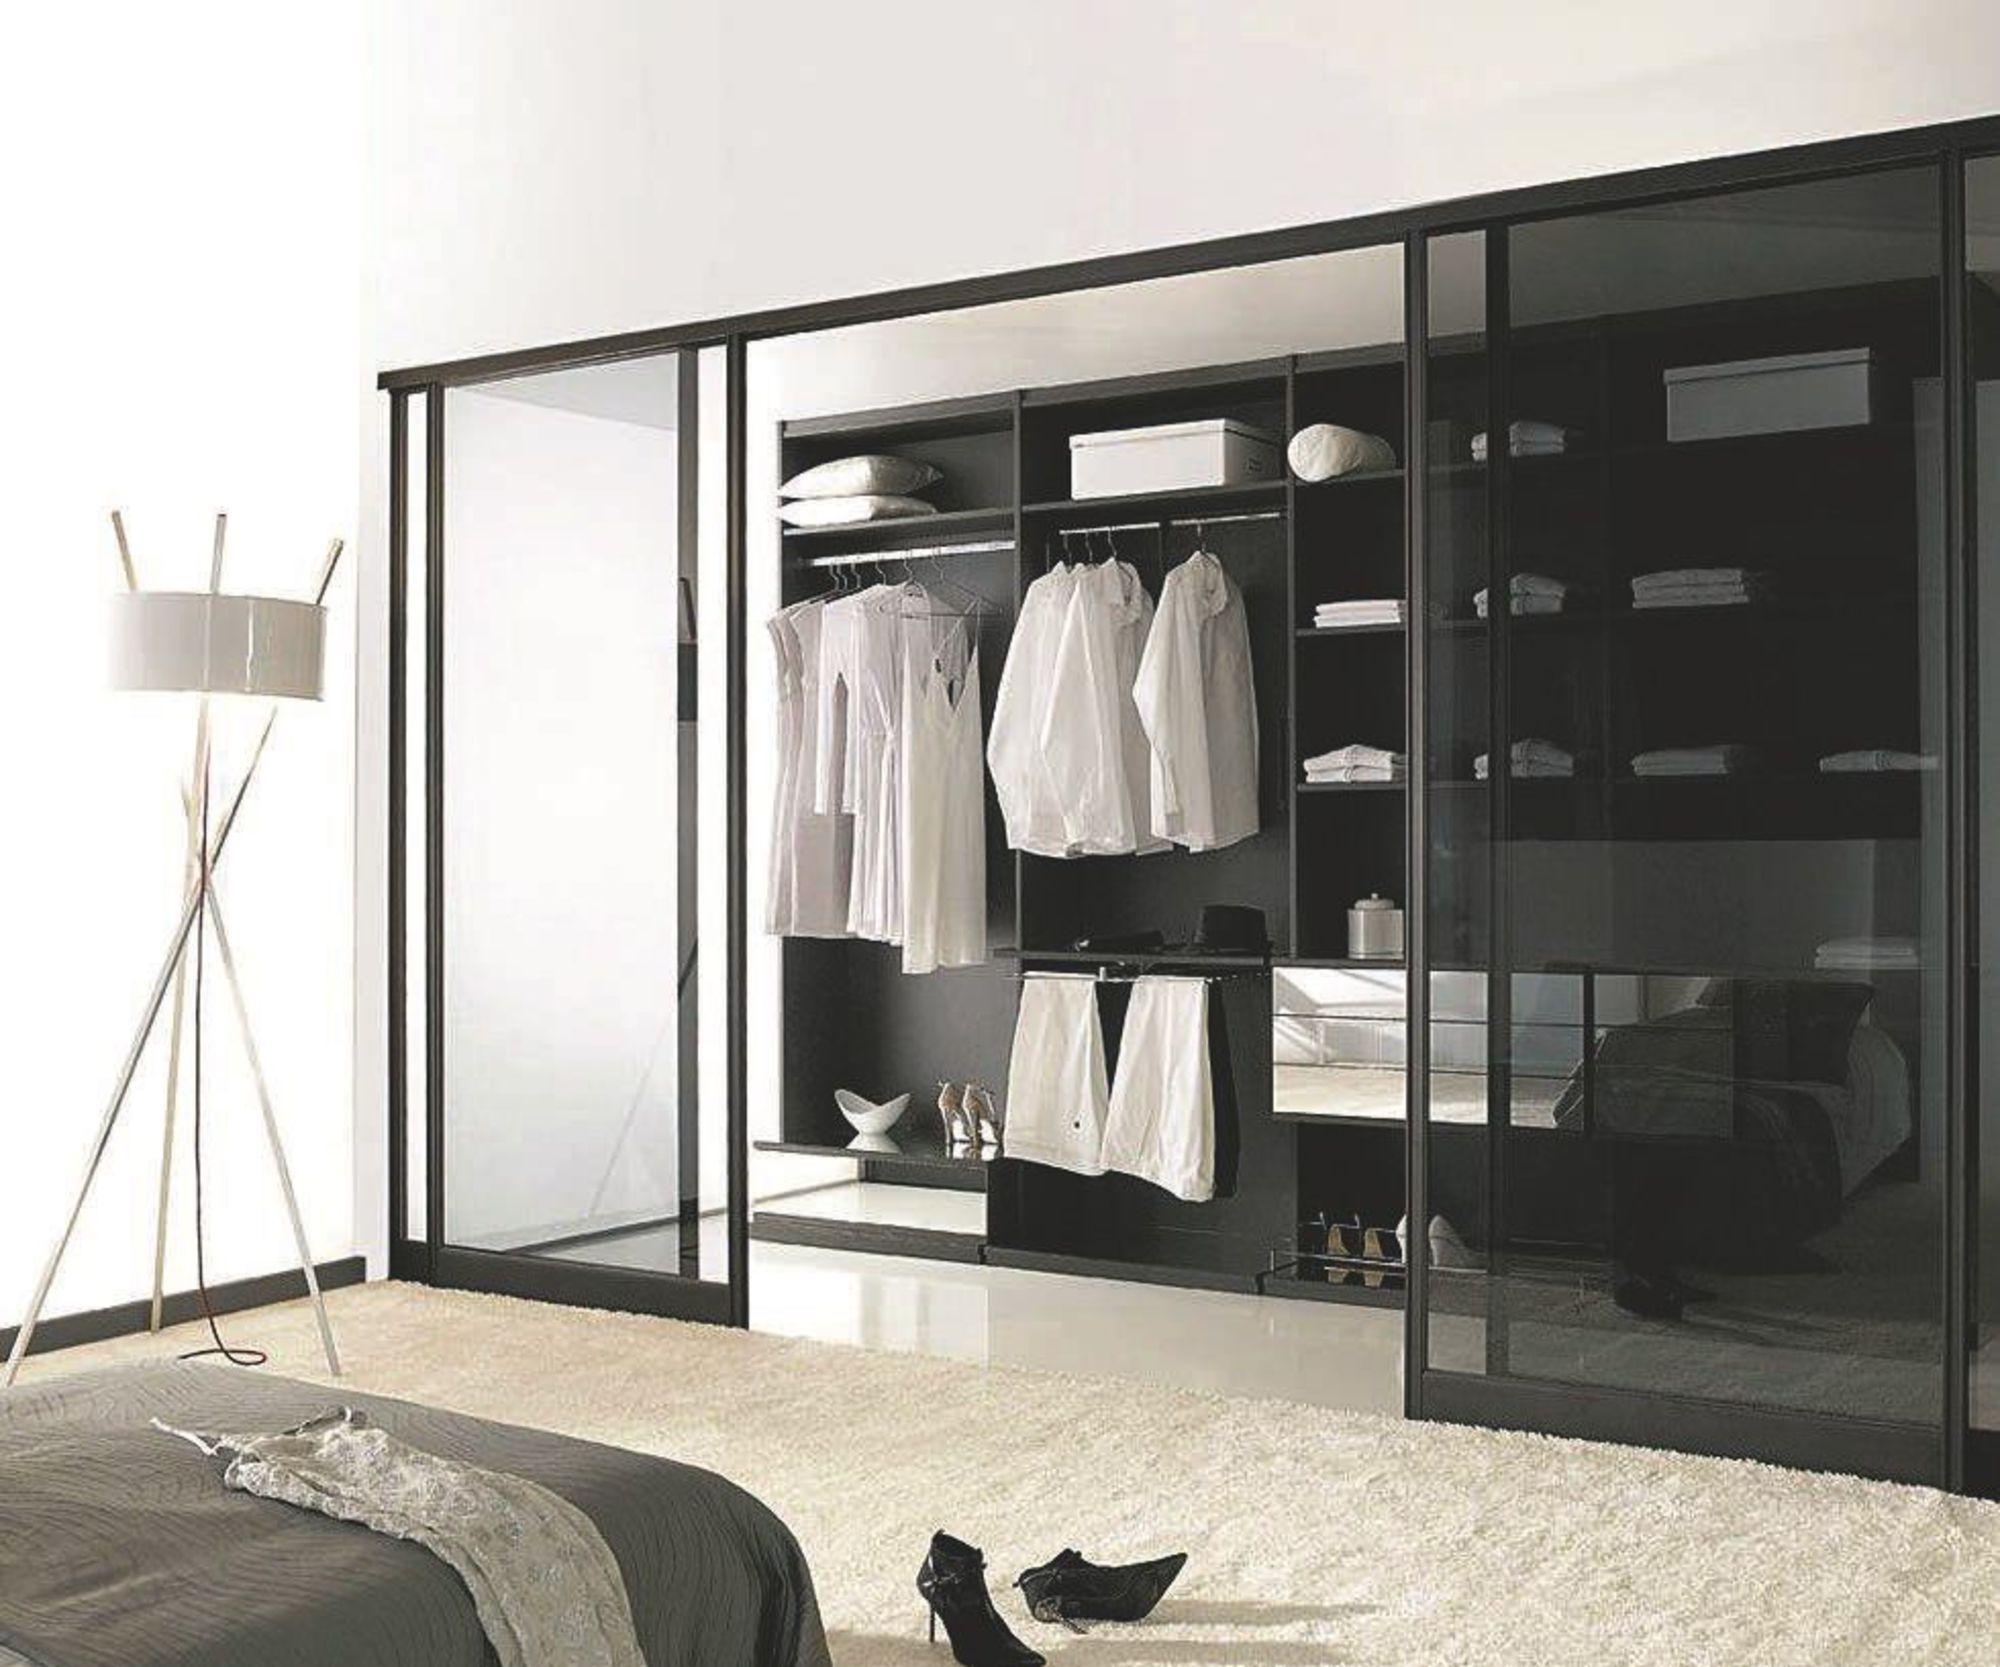 Dressing Table Dressing Rooms Bedroom Dresses Bb Sliding Doors Cupboard Doors Elle Decor Custom In